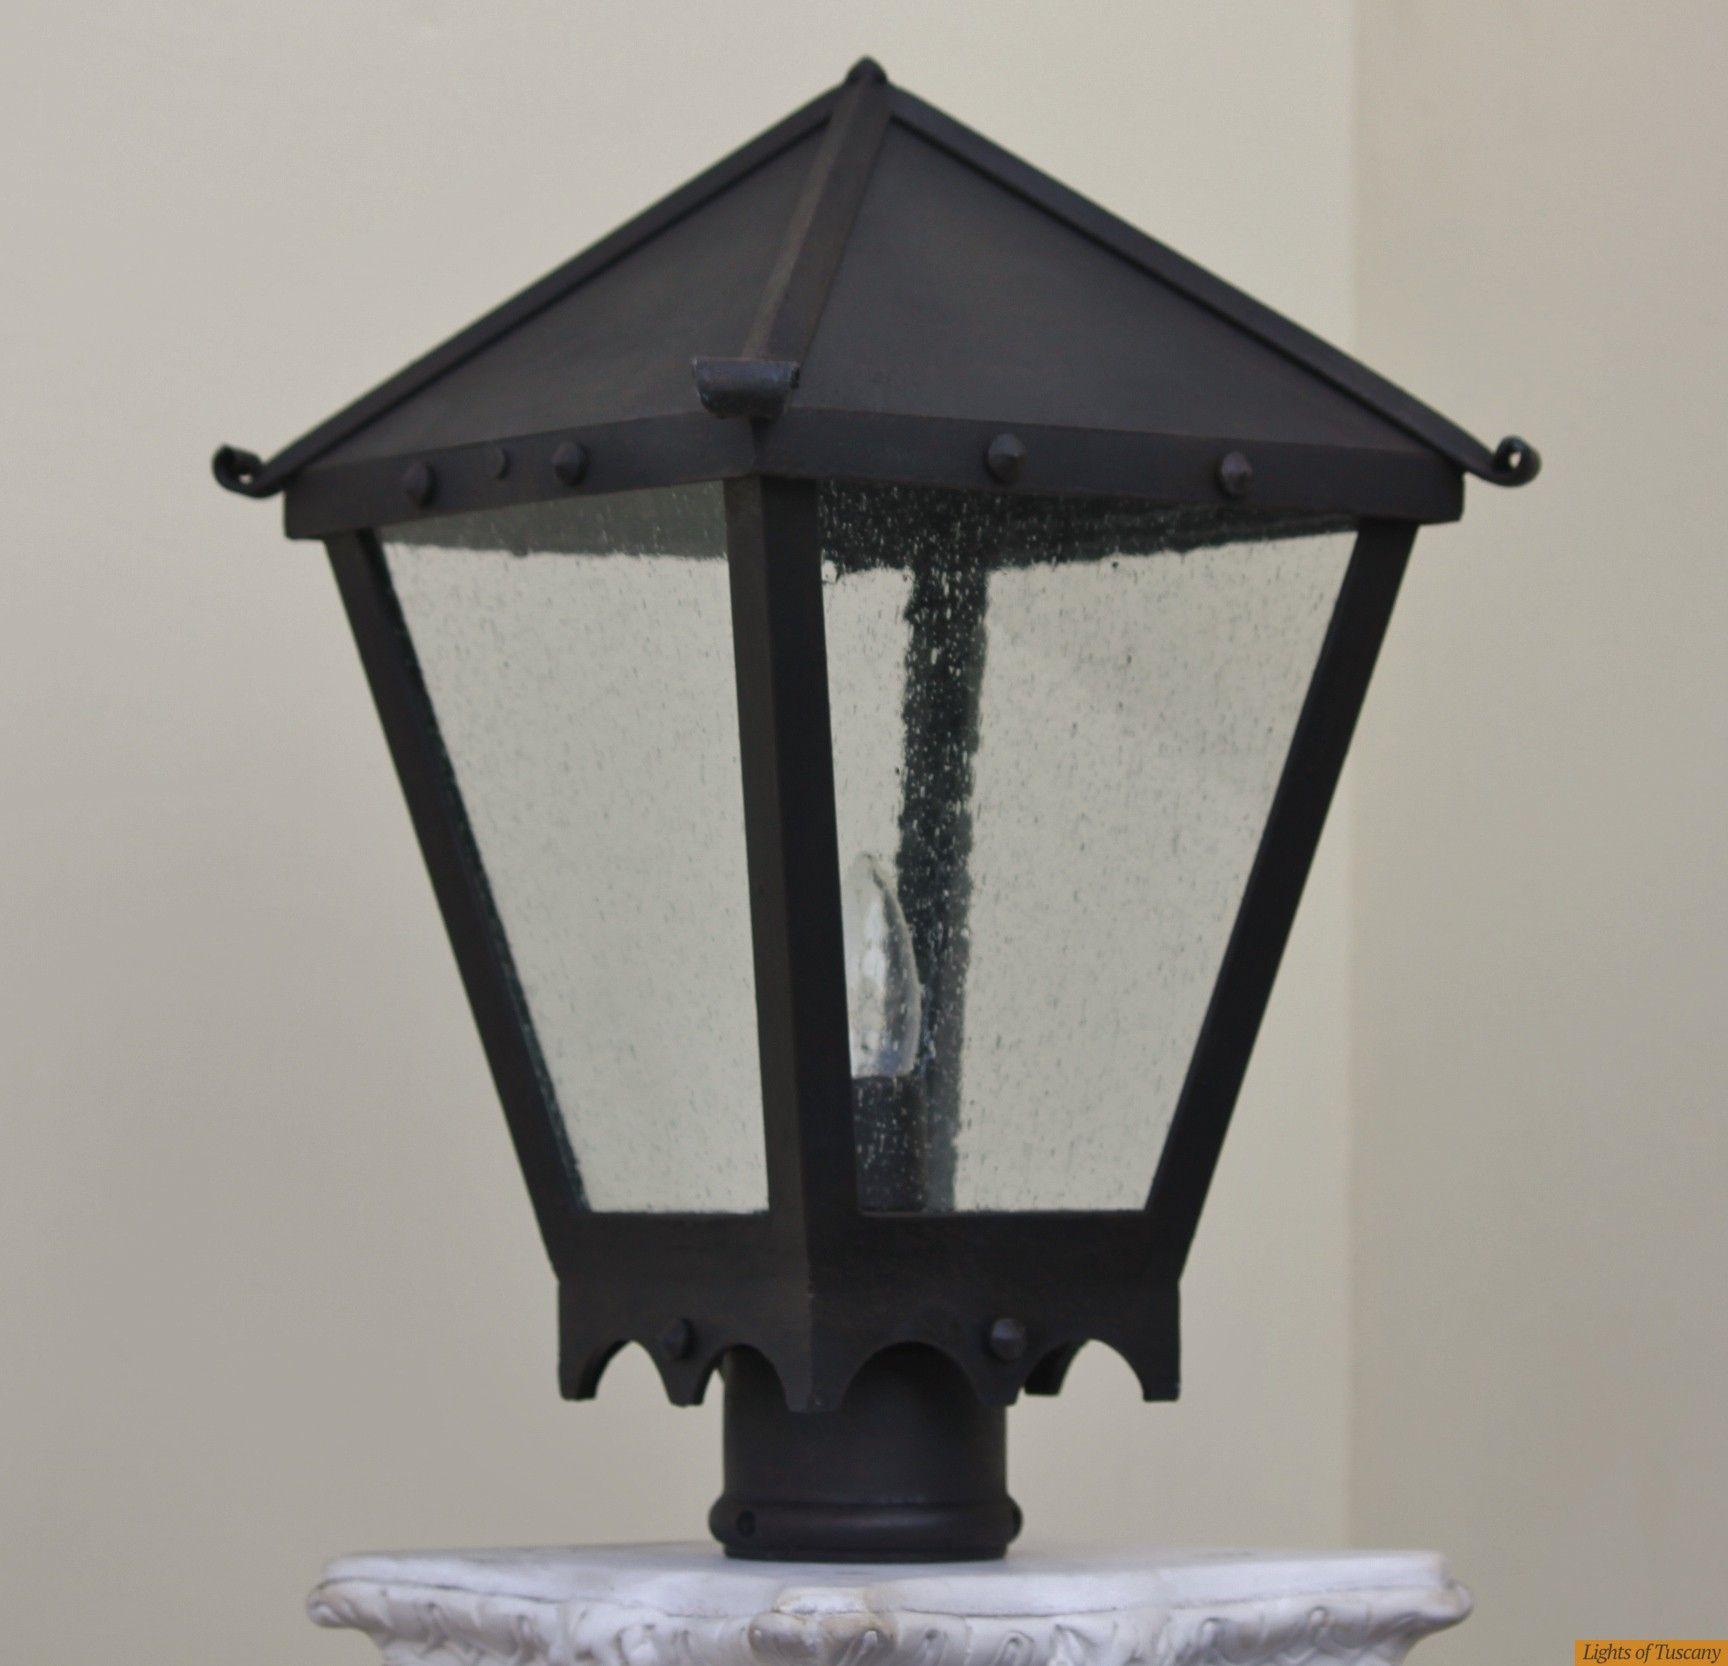 Lights Of Tuscany 7411 1 Spanish Style Post Lamp Outdoor Exterior Post Lighting Outdoor Exterior Fixtures Fixtures Post Lighting Lamp Spanish Style